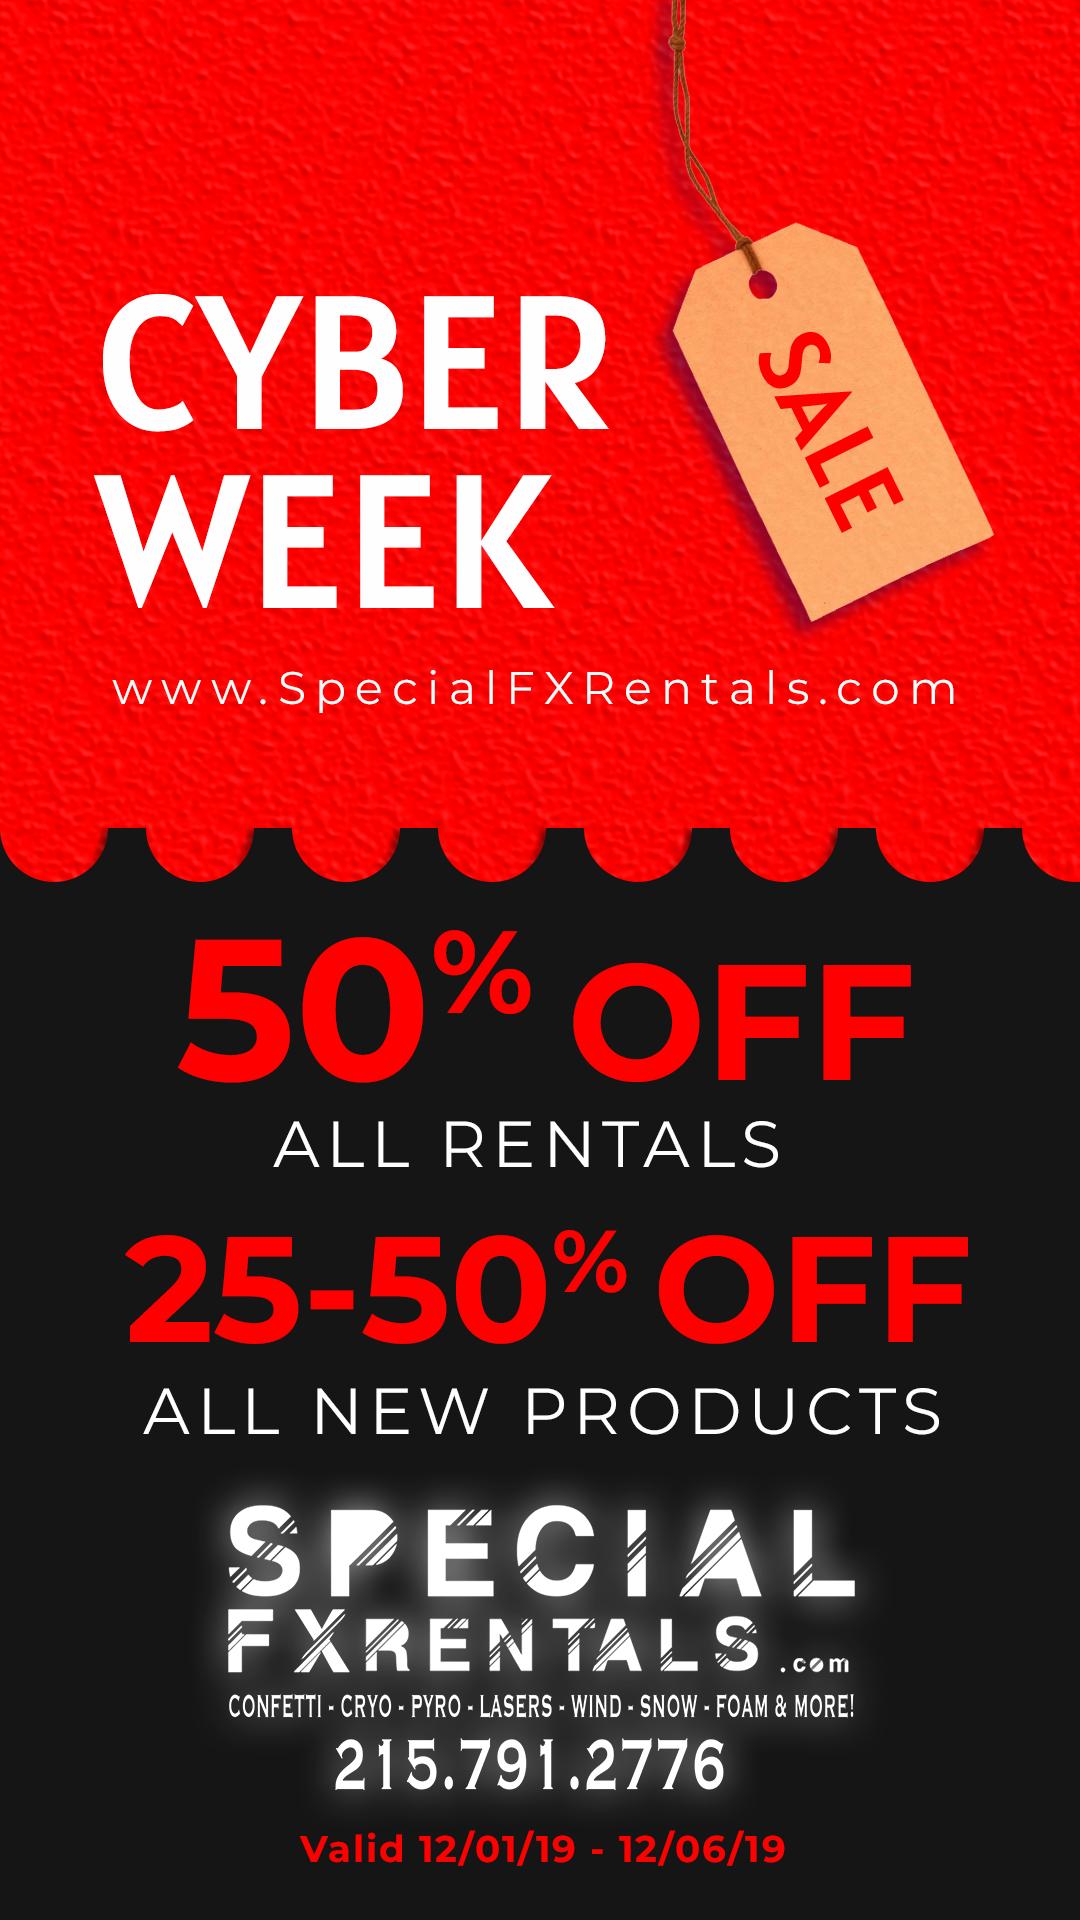 Special FX Rentals Cyber Week Sale